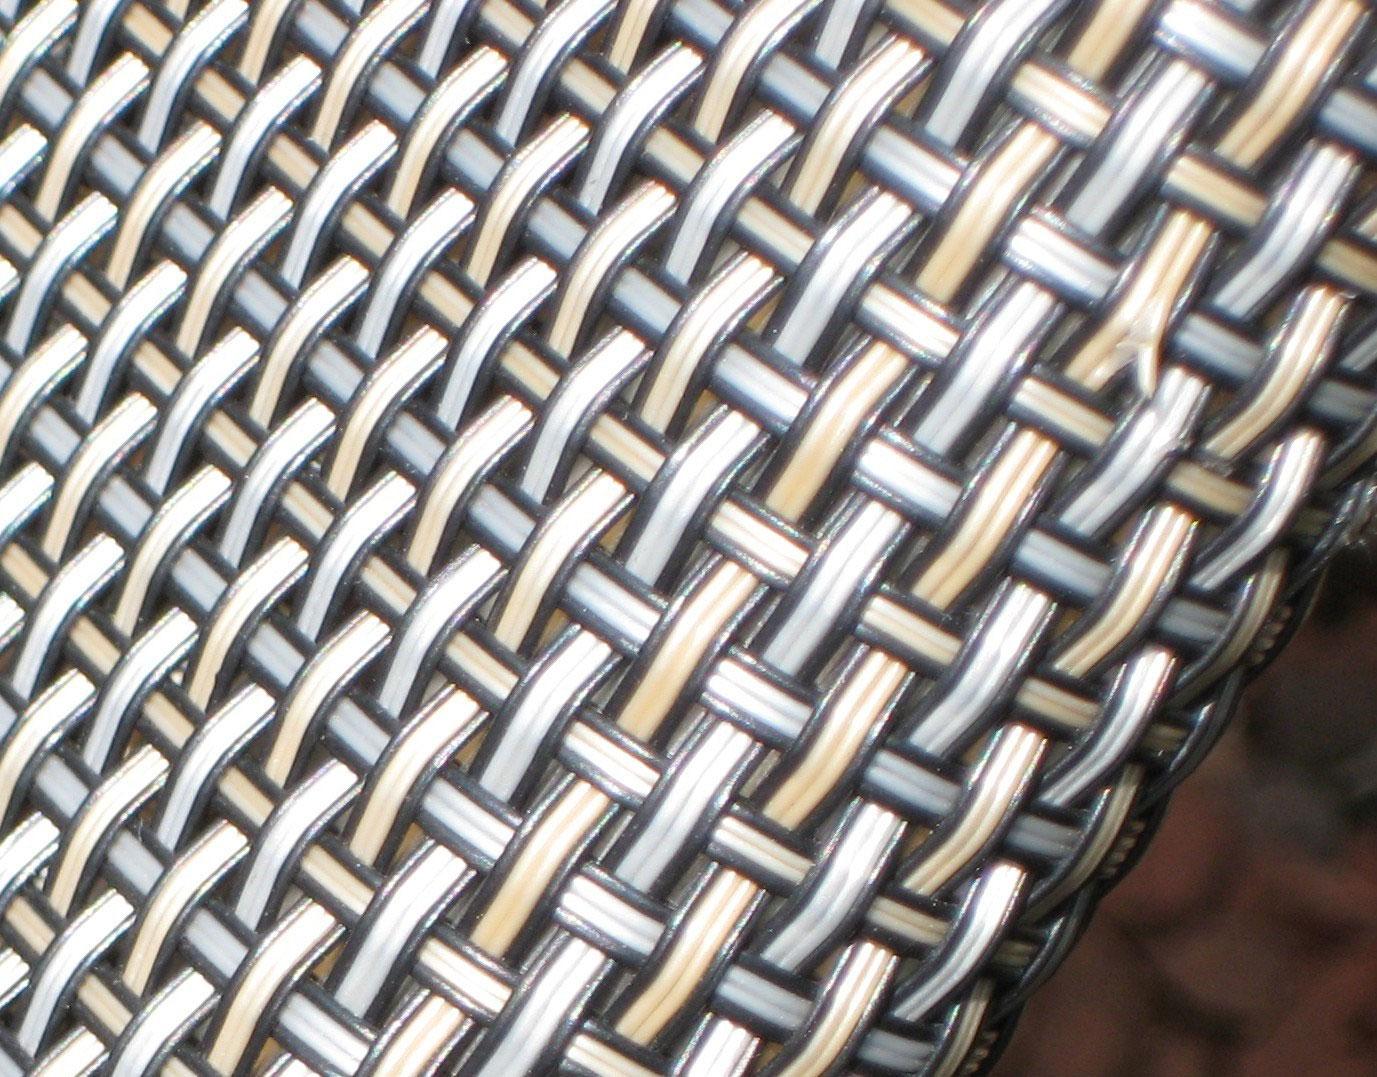 gartenliege sonnenliege leco royal edelstahl anthrazit grau silber bei. Black Bedroom Furniture Sets. Home Design Ideas